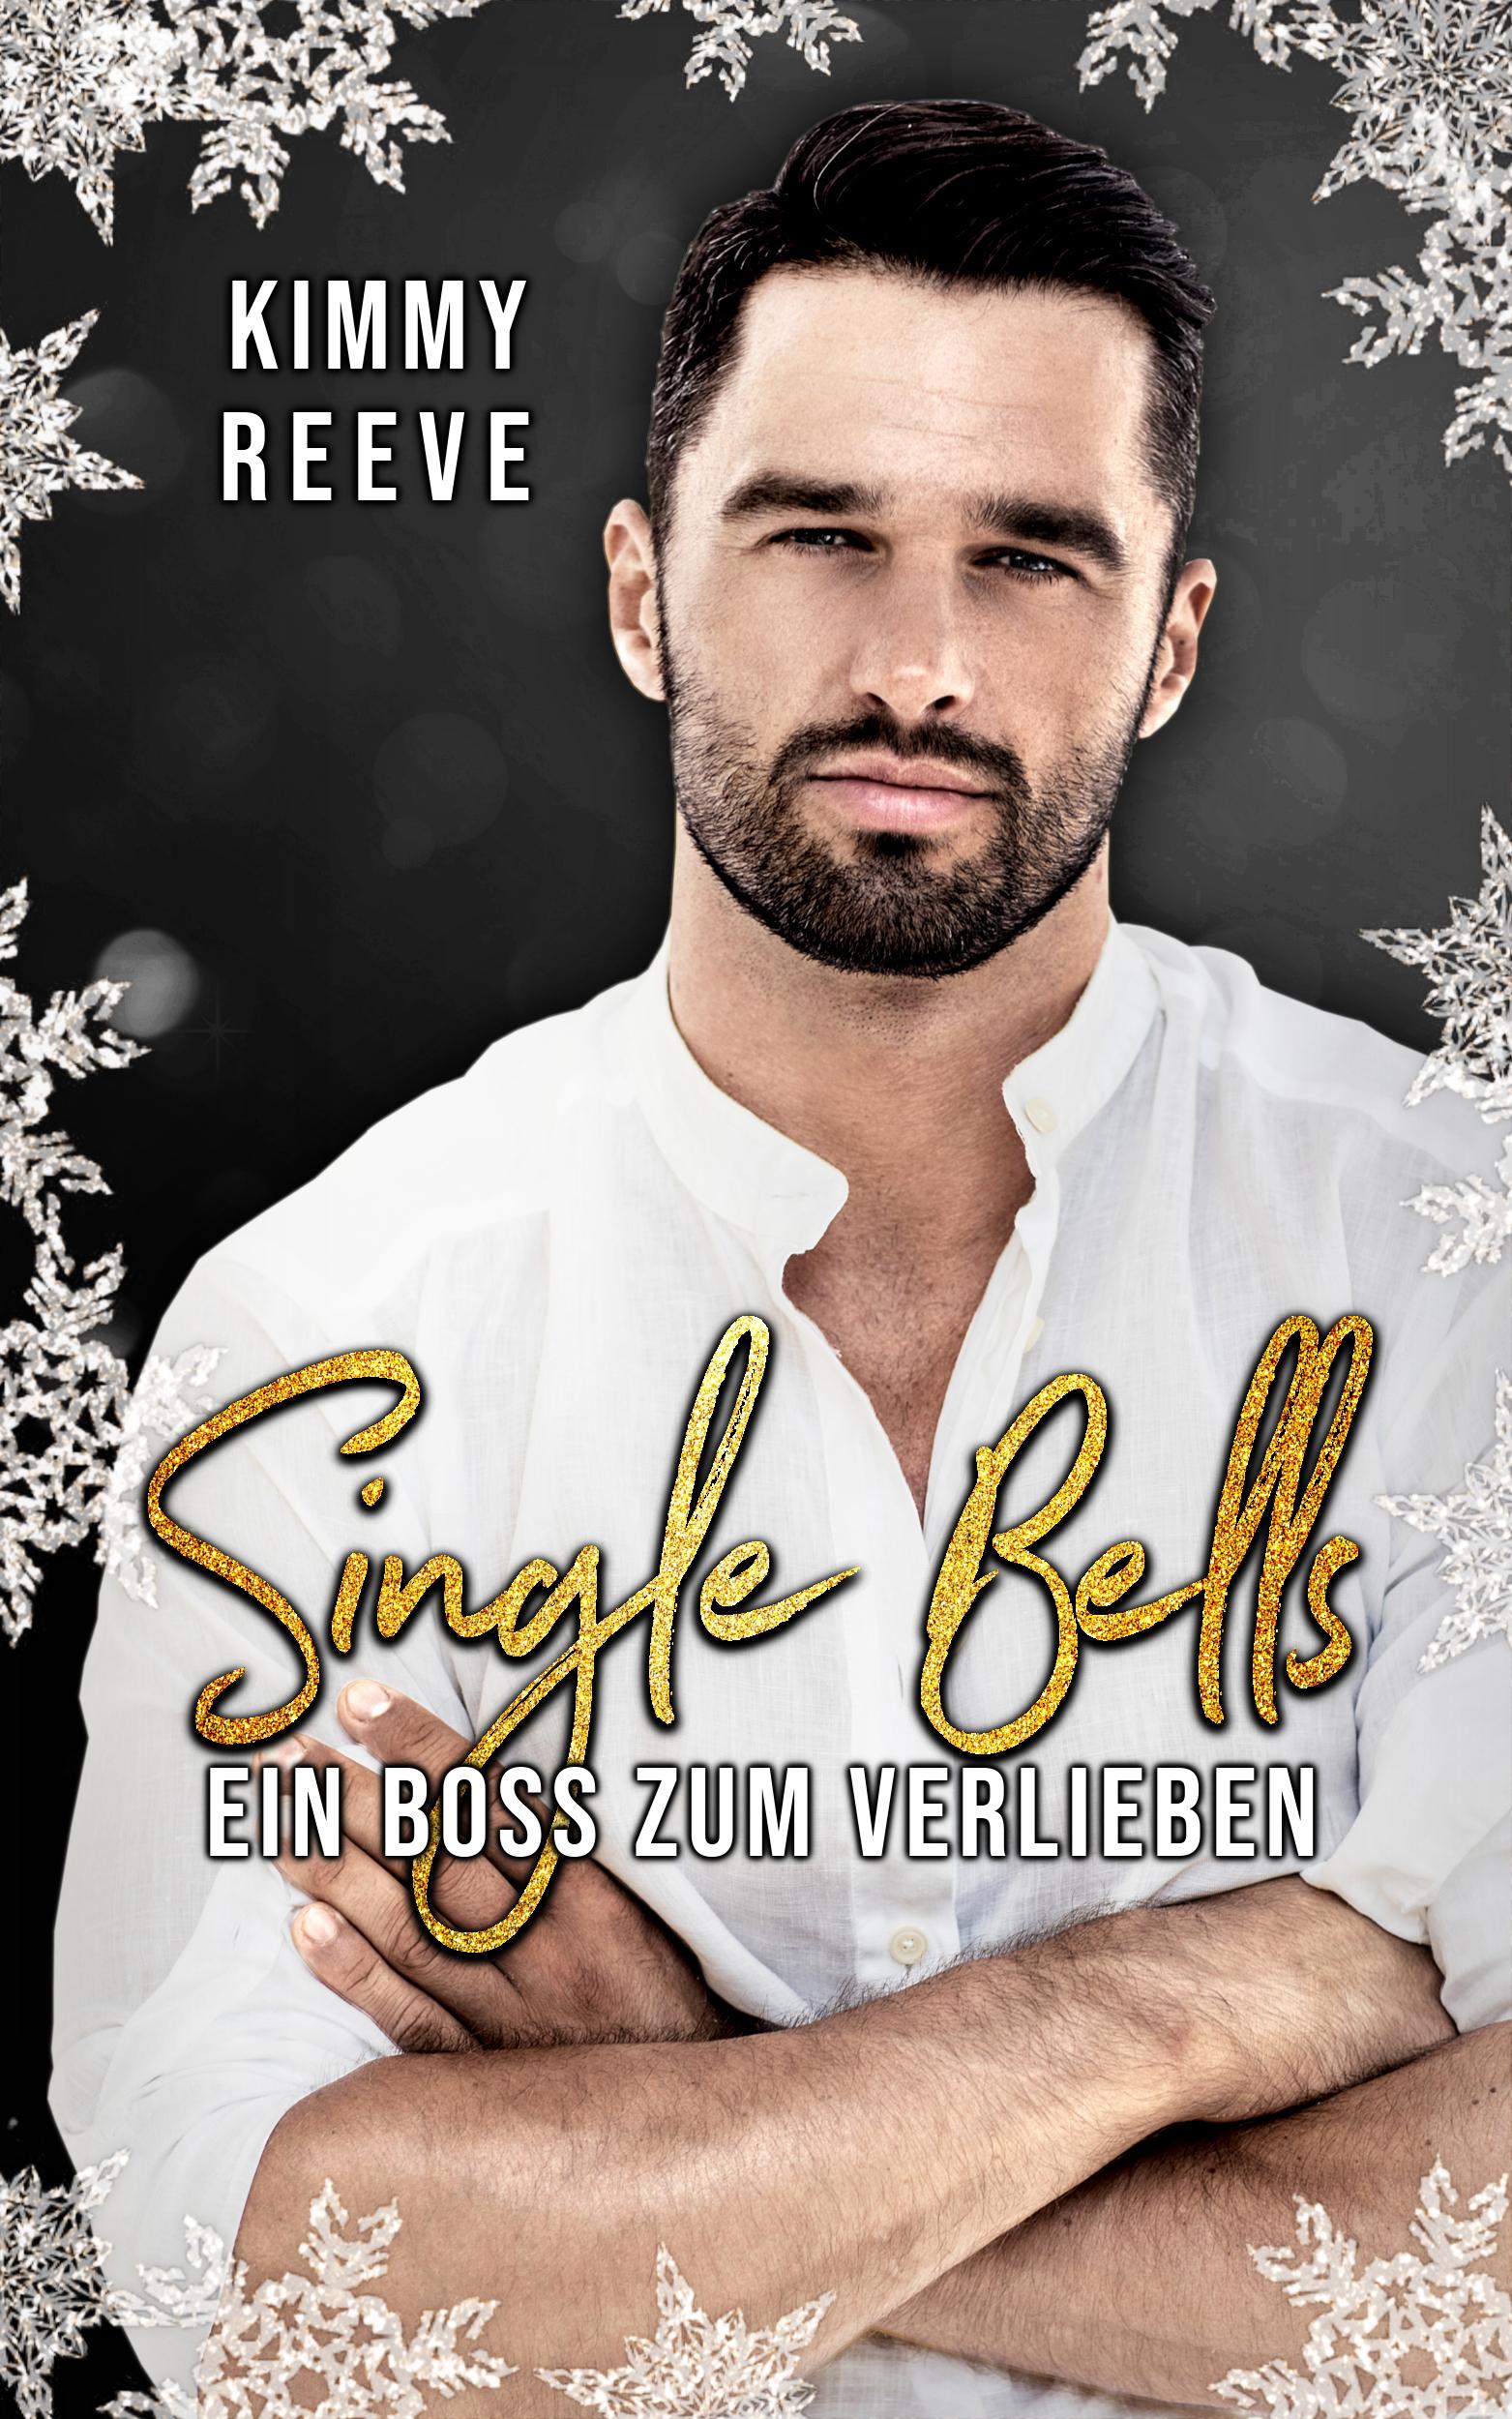 Single Bells-1_Kimmy Reeve